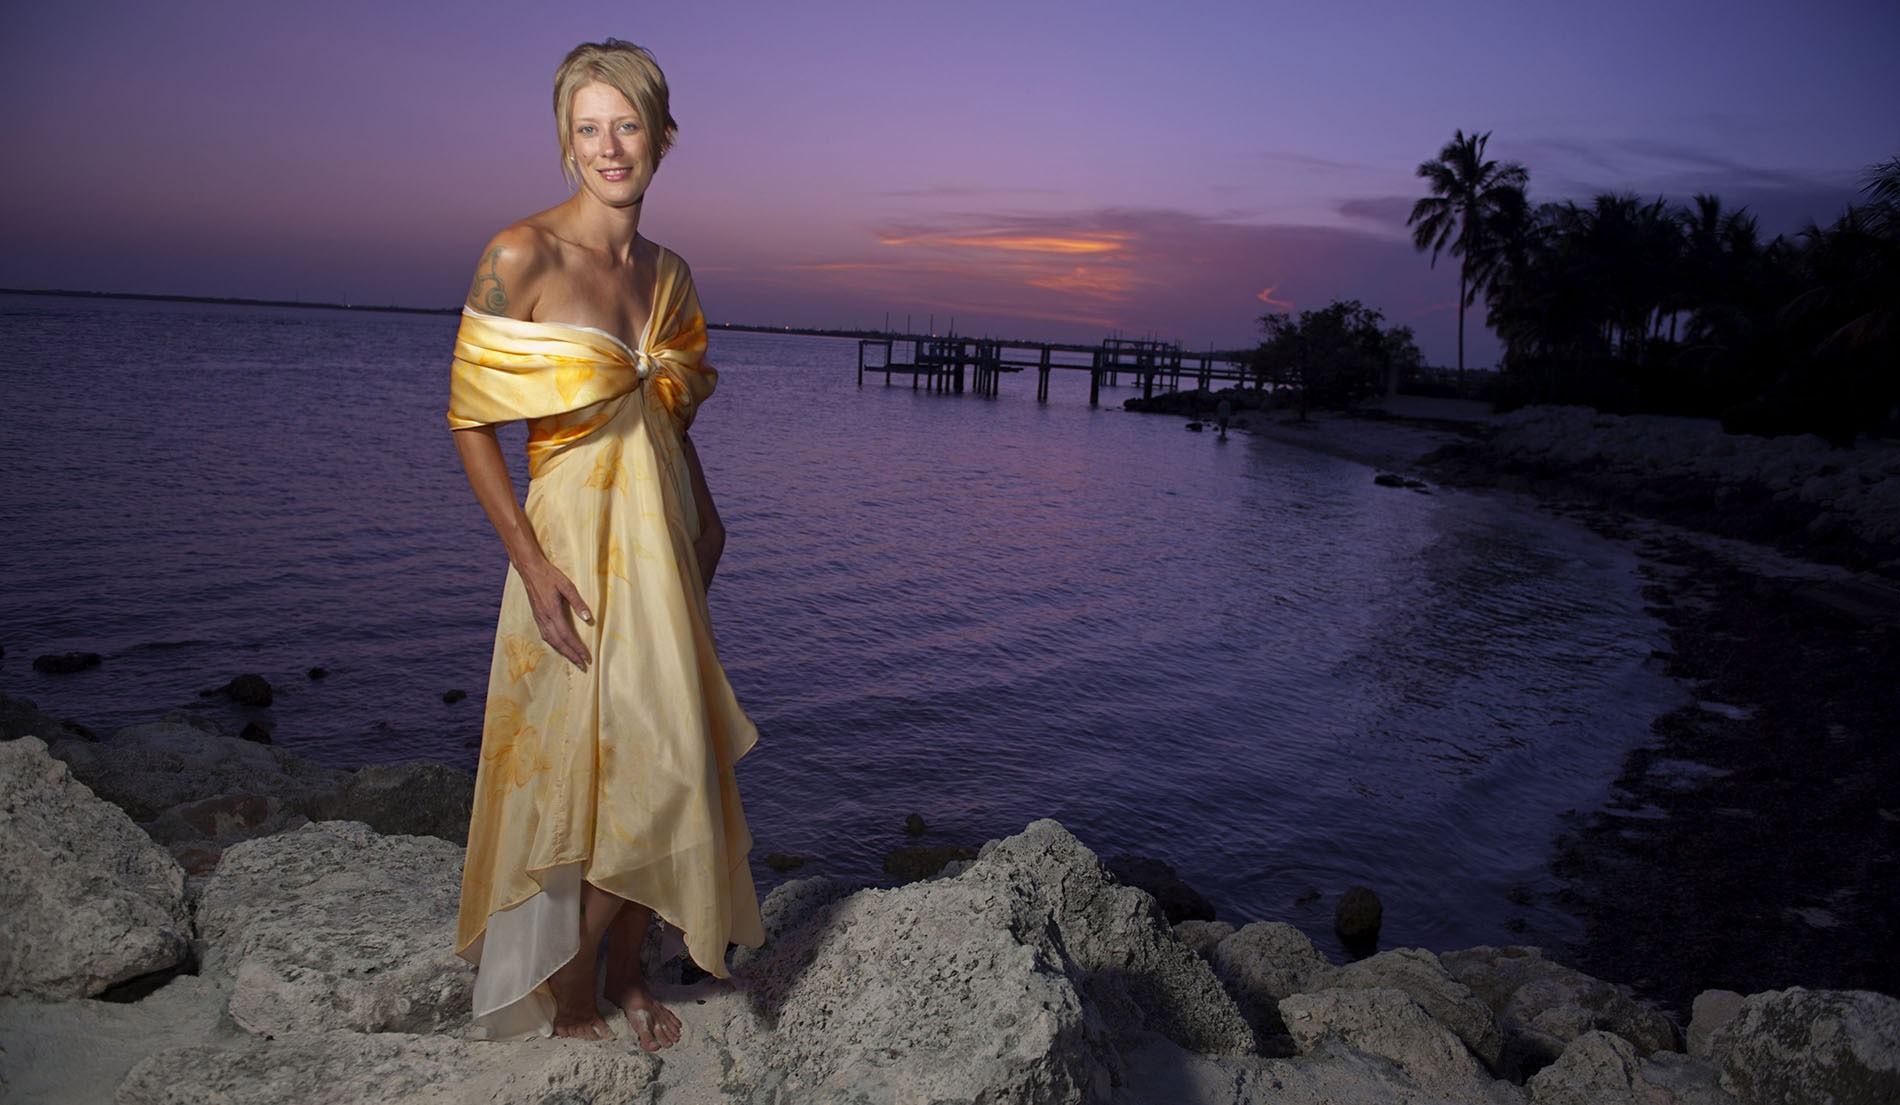 V Neck Beach Inspired Wedding Dresses - Look 3 Front